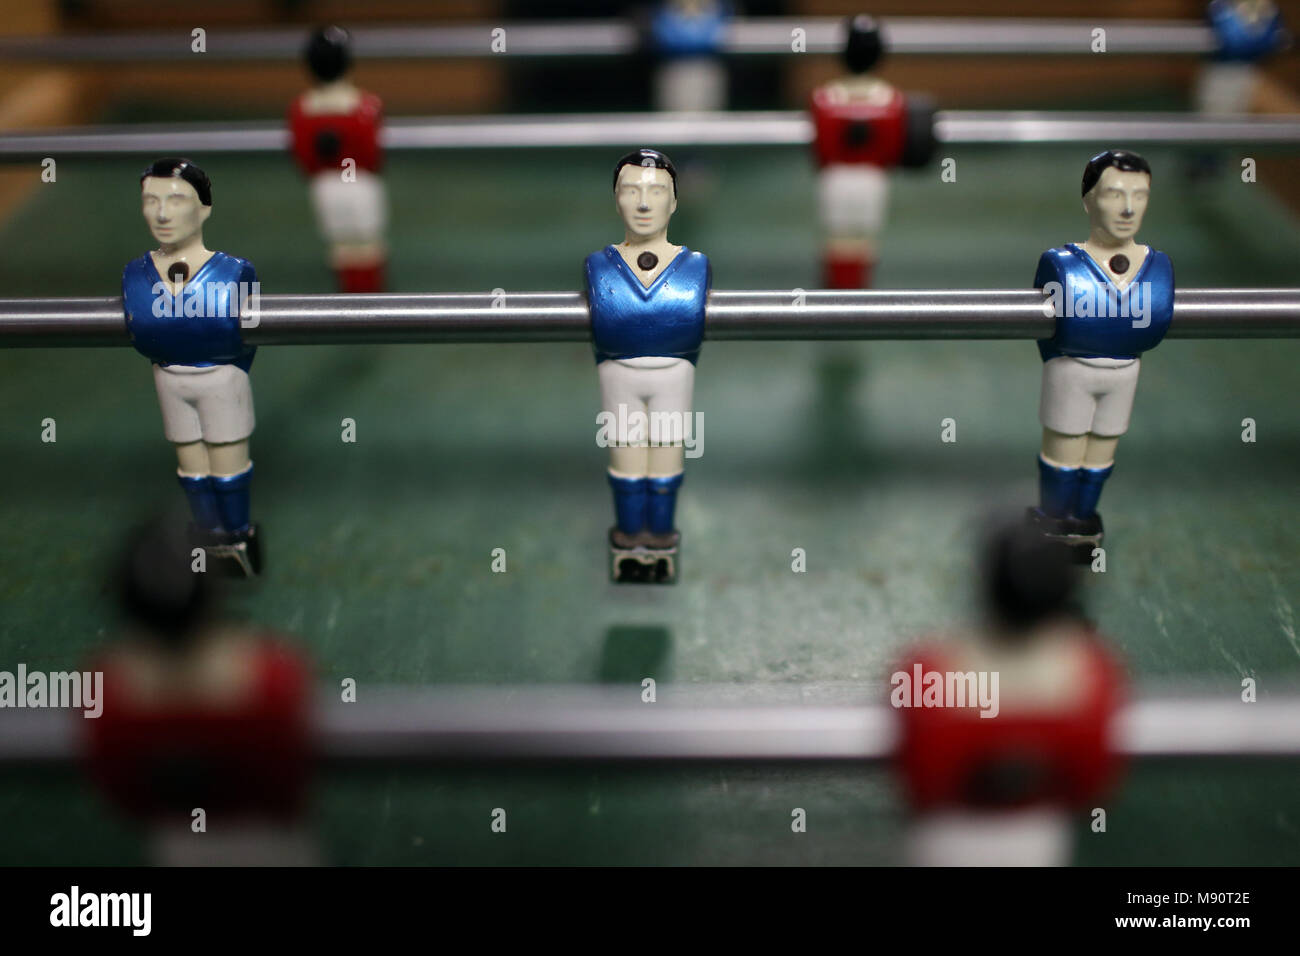 Table football players. - Stock Image